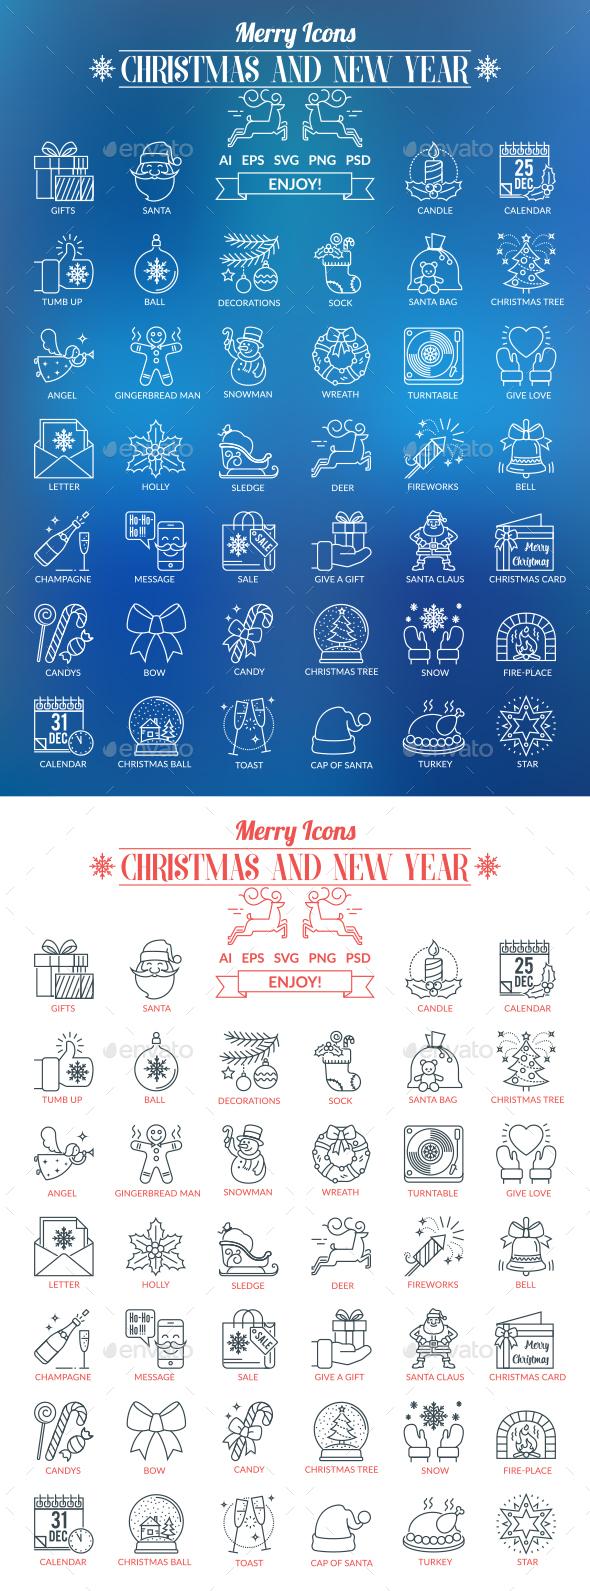 Christmas and New Year Outline Icons - Seasonal Icons